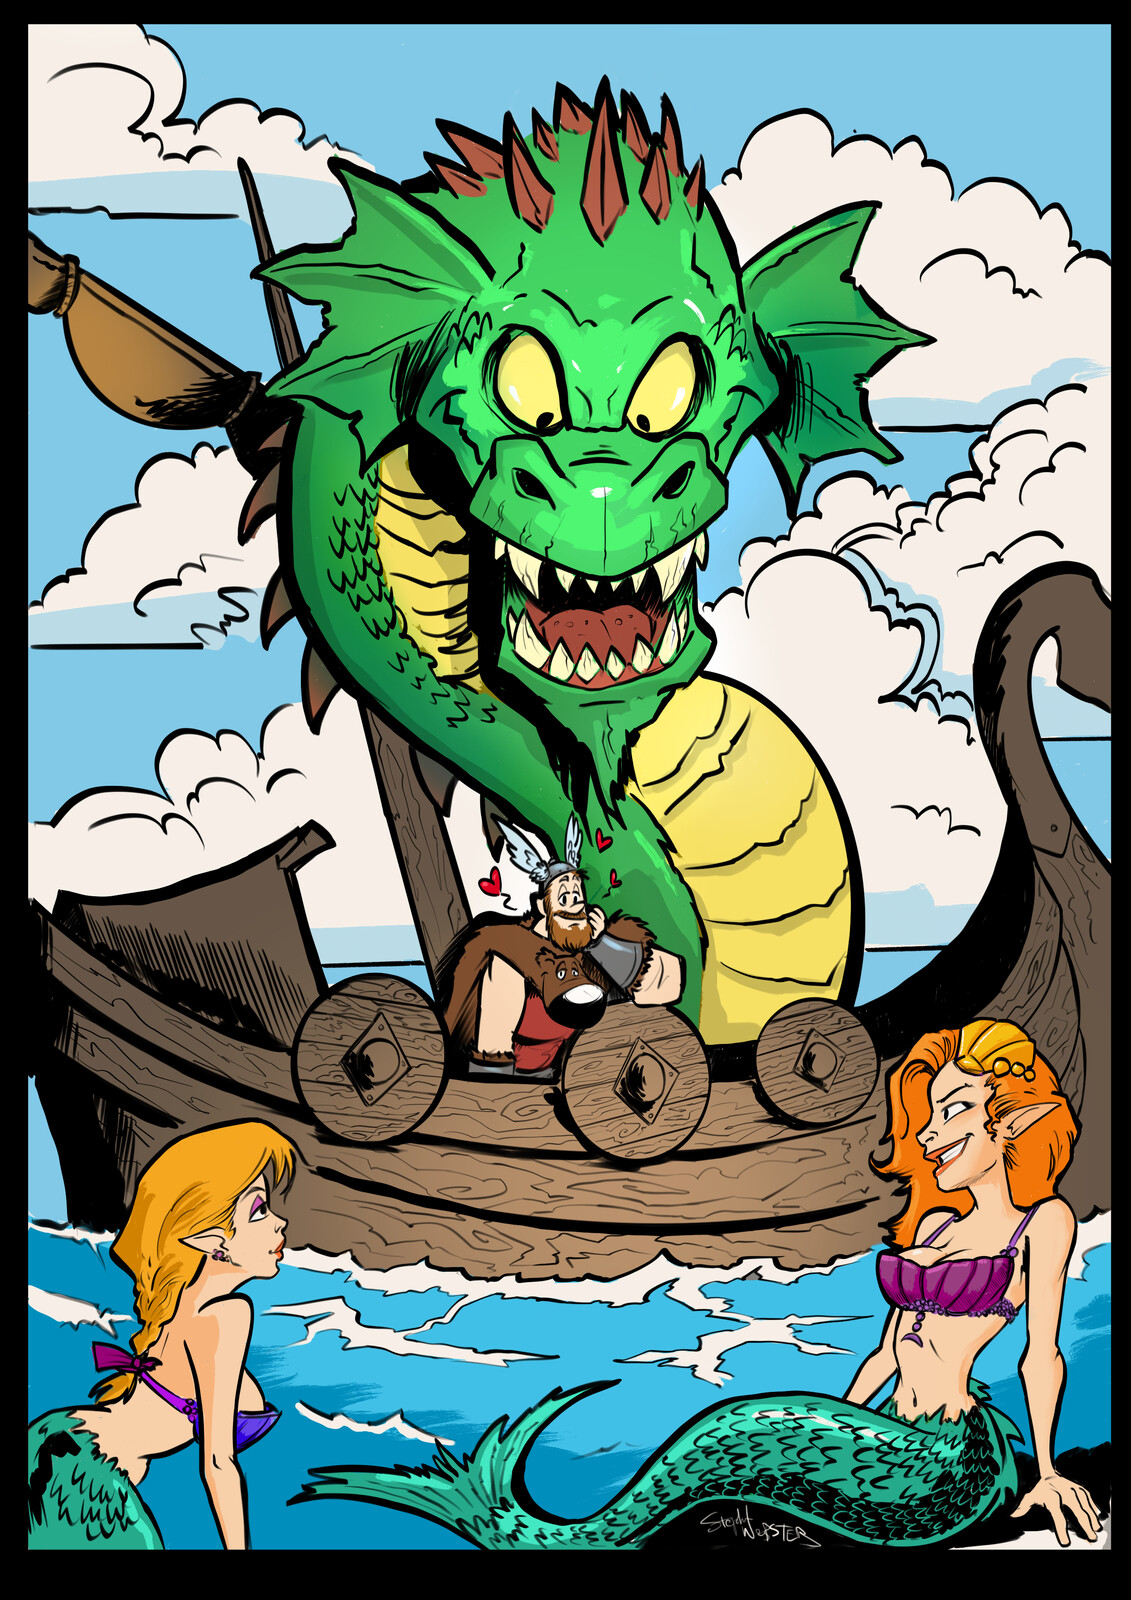 The Danger of Mermaids